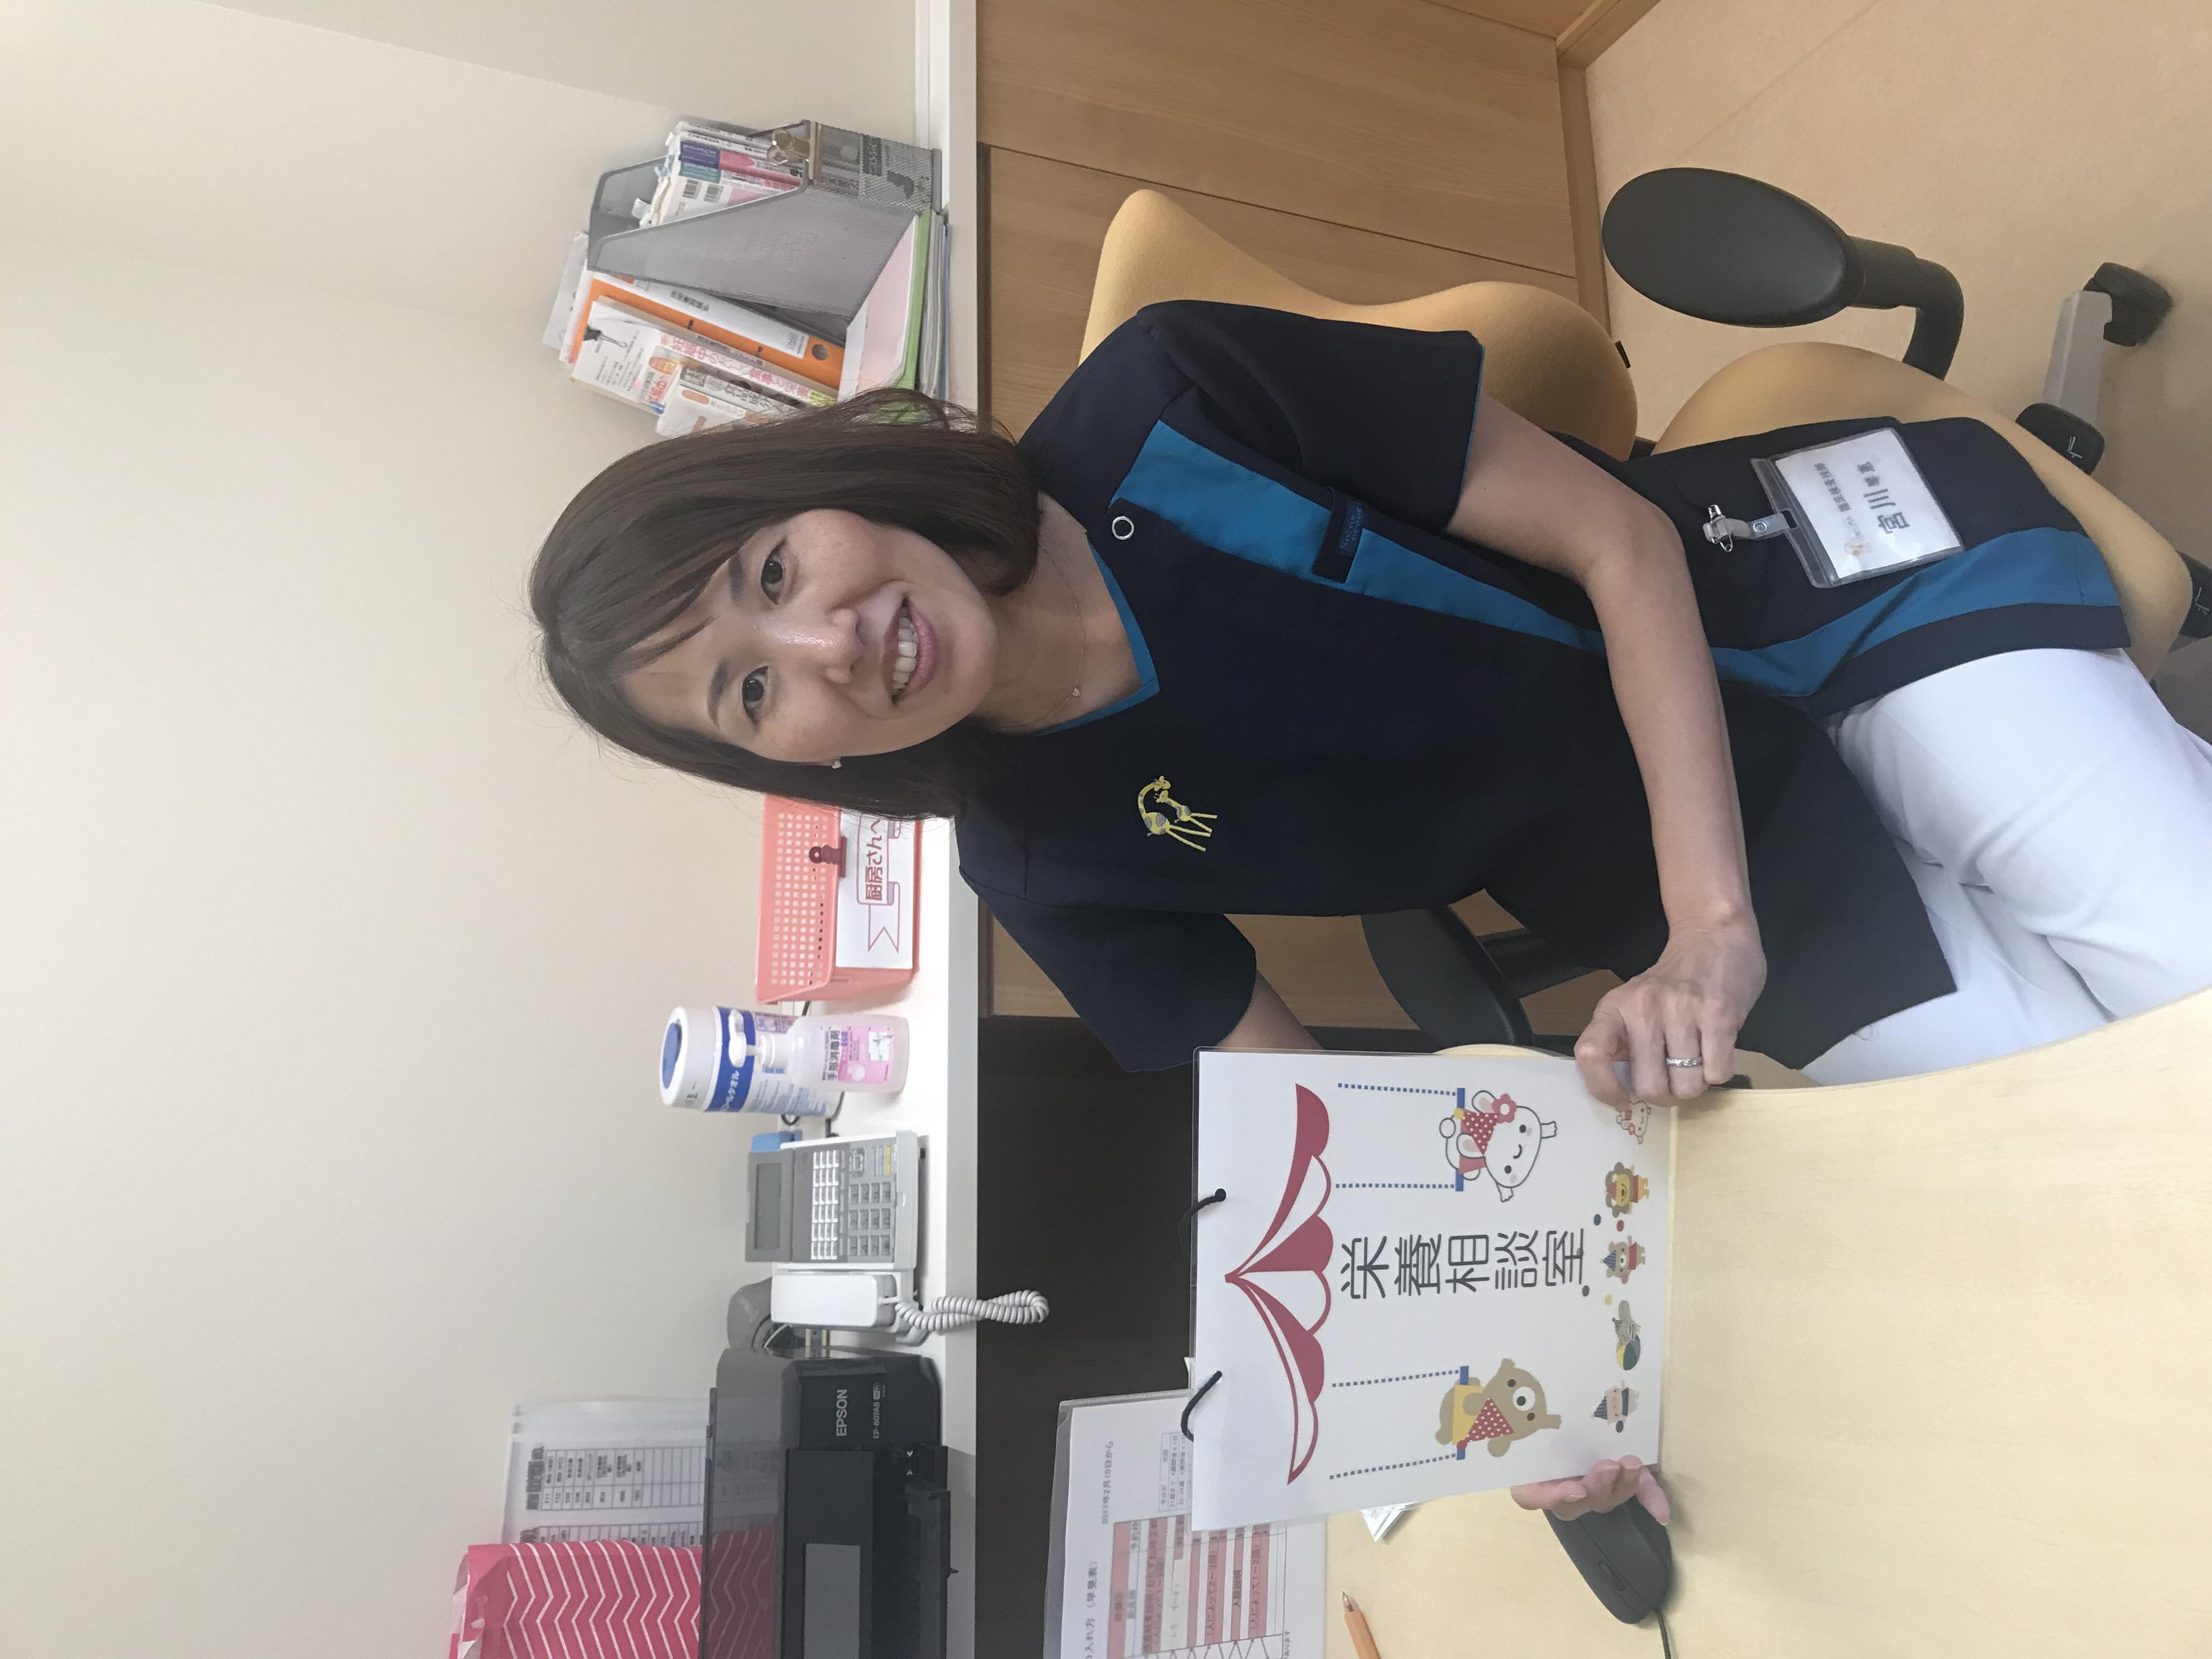 http://www.itakura-cli.jp/staffblog/upload/images/IMG_5422.jpg